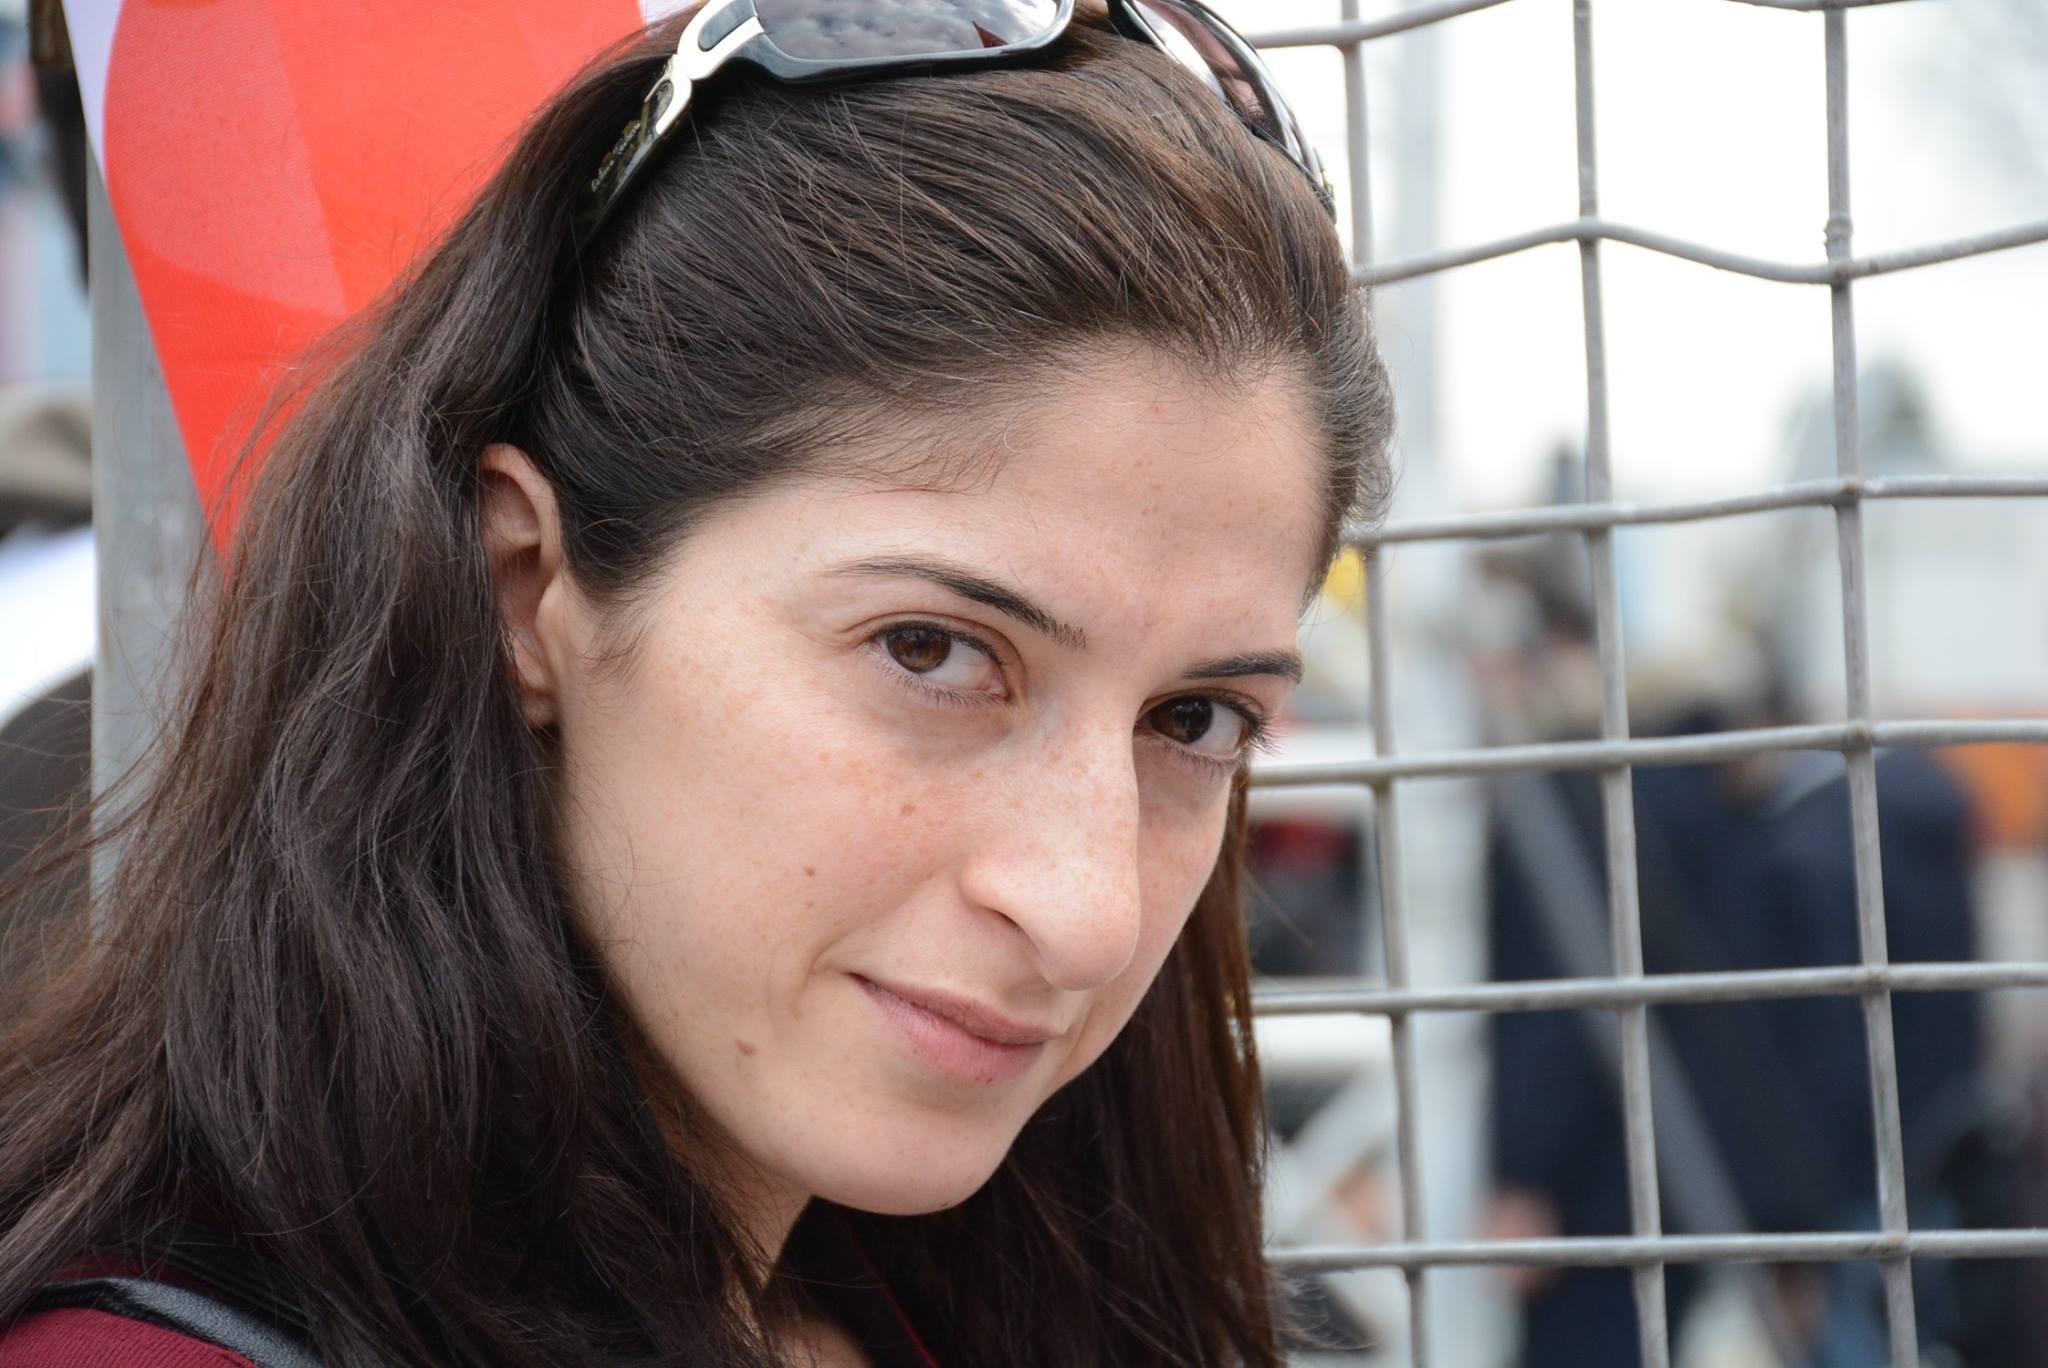 Alman vatandaşı gazeteci Meşale Tolu'ya tahliye kararı